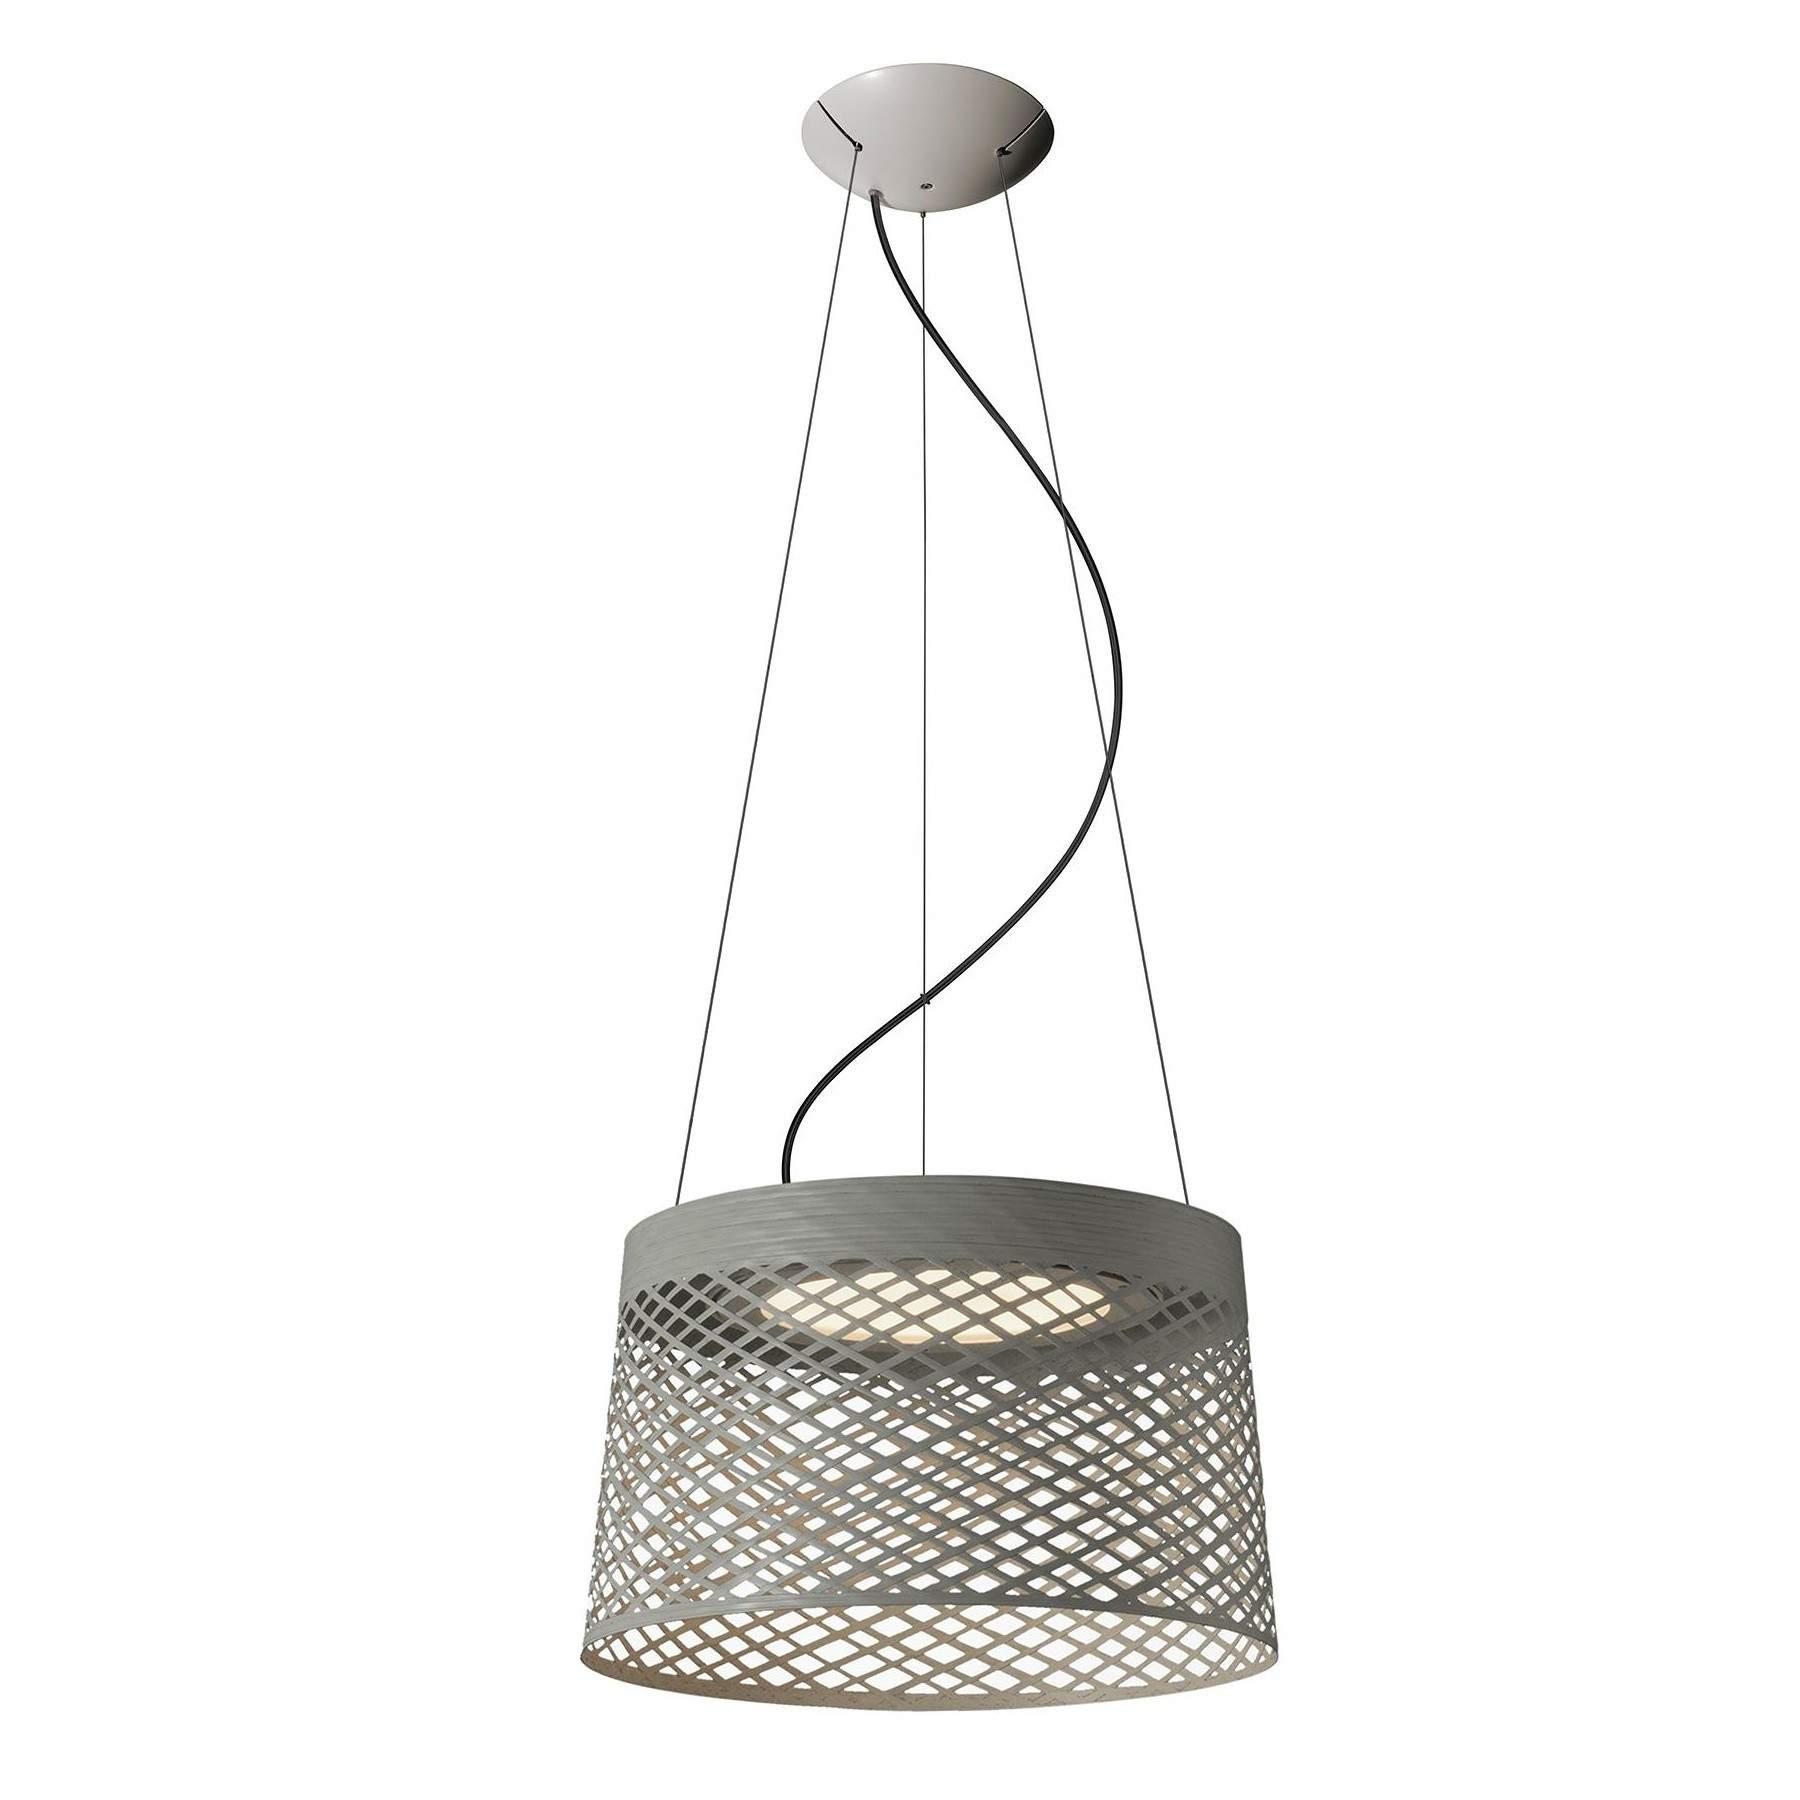 Foscarini Twiggy Grid LED Outdoor Pendelleuchte 1800x1800 ID ec7b181a0e4831a516c5c5699a